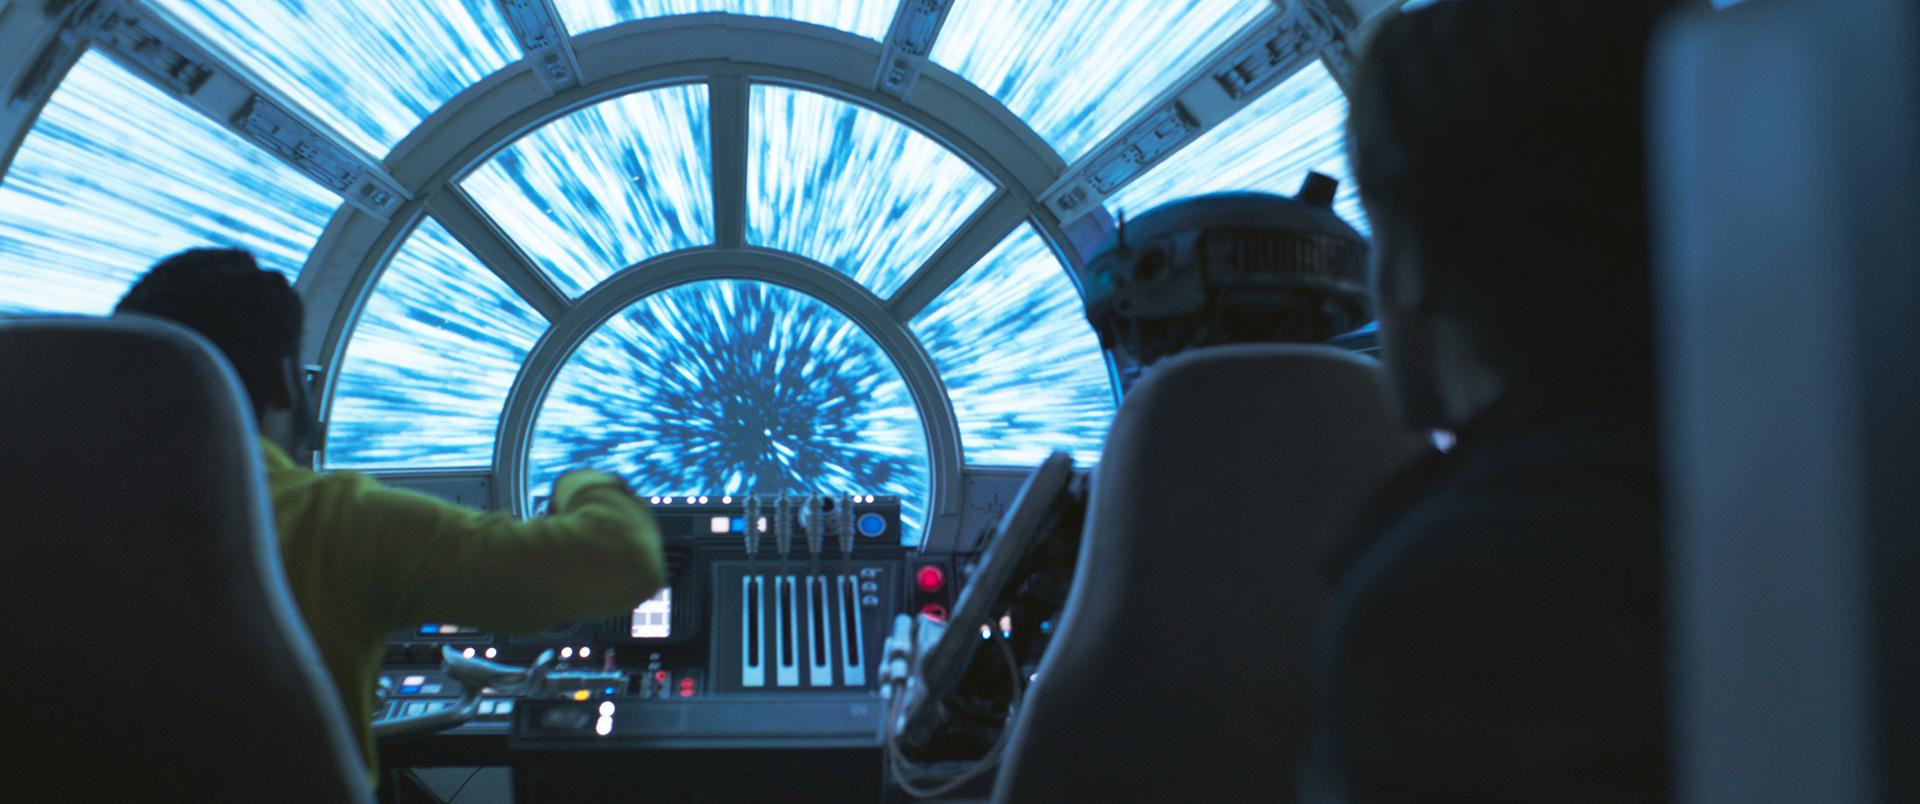 Industrial Light & Magic, Visual Effects | Lucasfilm Ltd